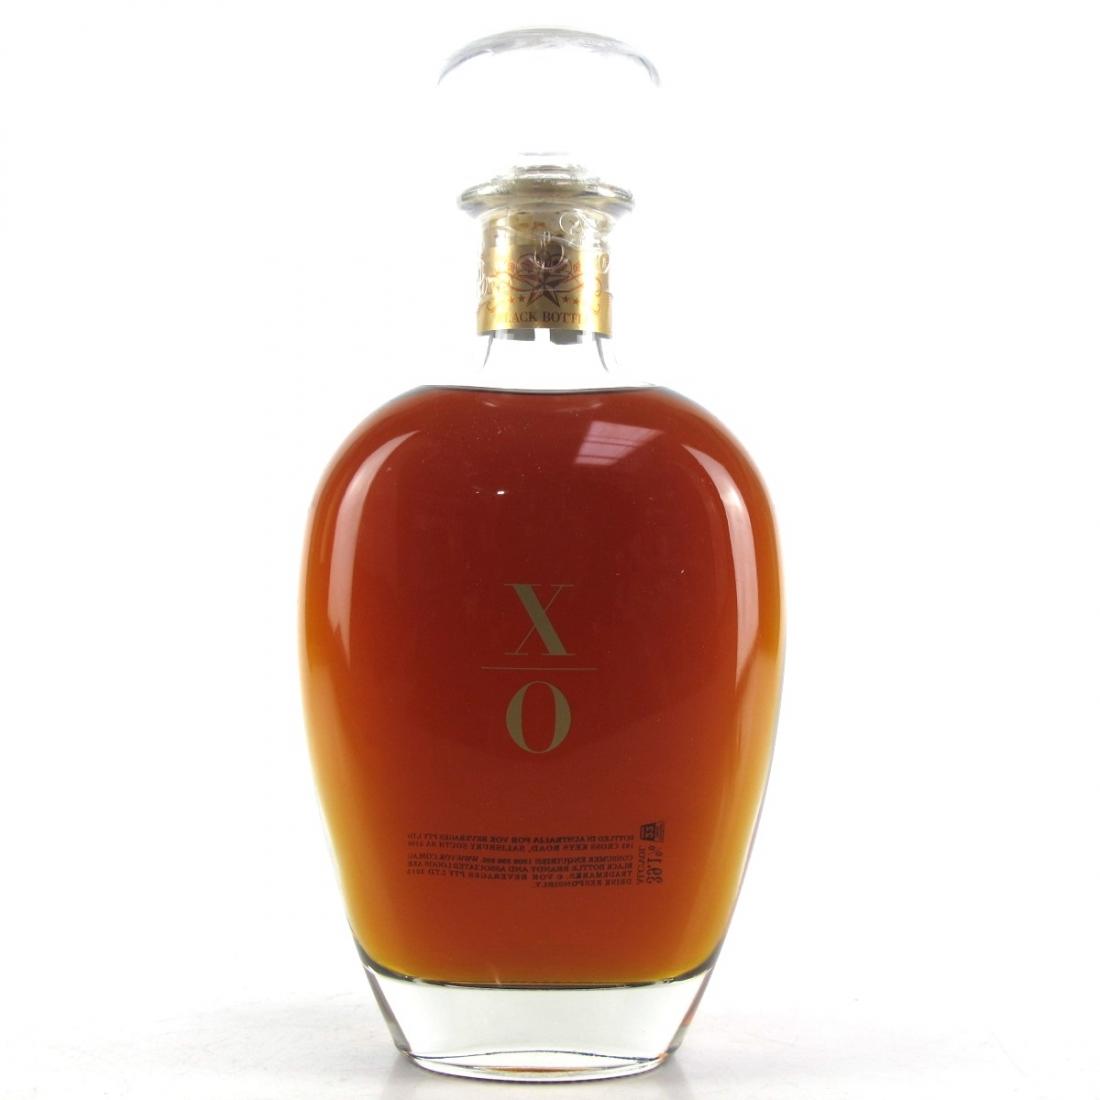 Black Bottle X/O Australian Brandy